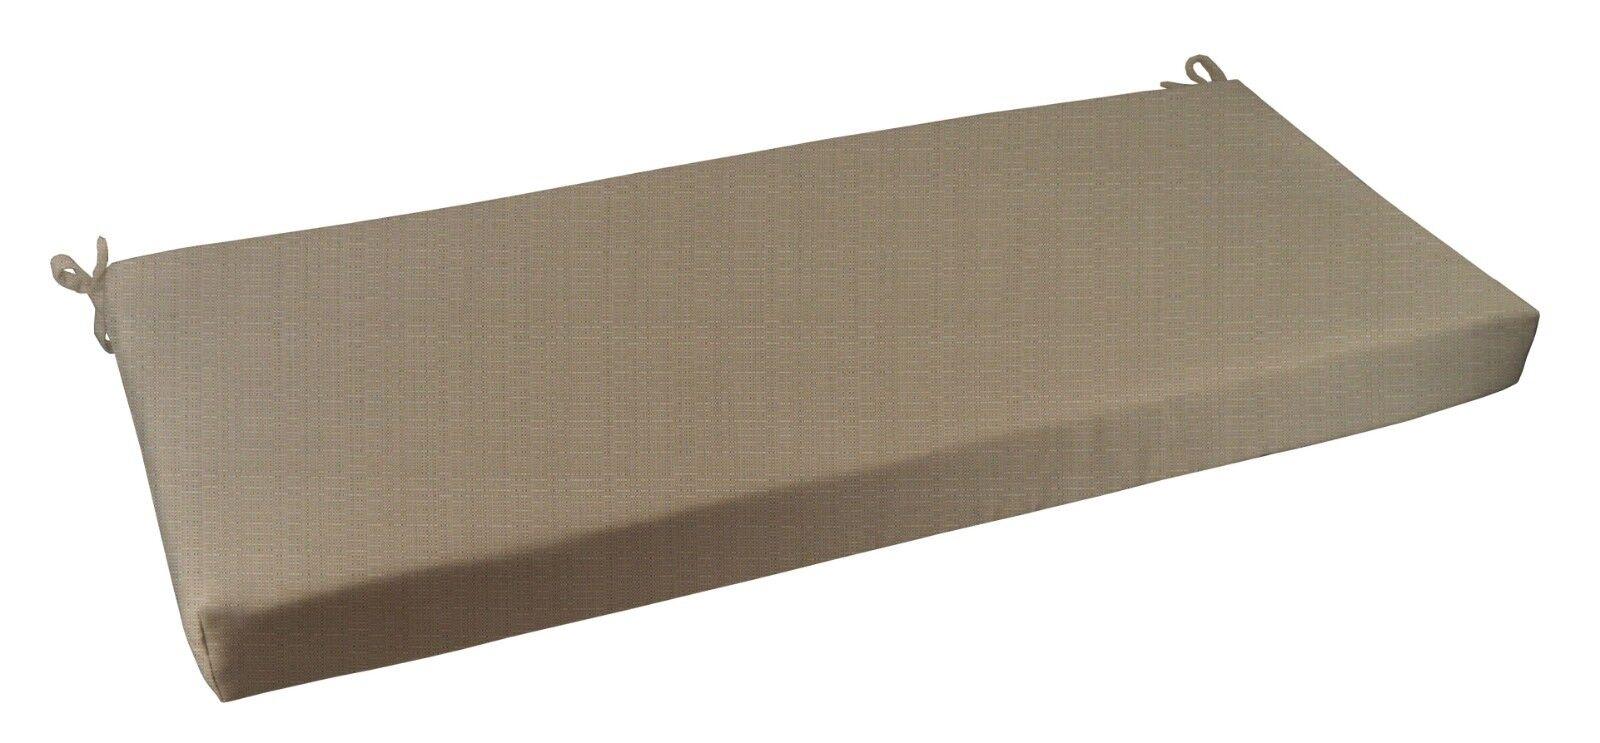 "Outdoor Bench Cushion Sunbrella Linen Champagne Fabric - 2"""